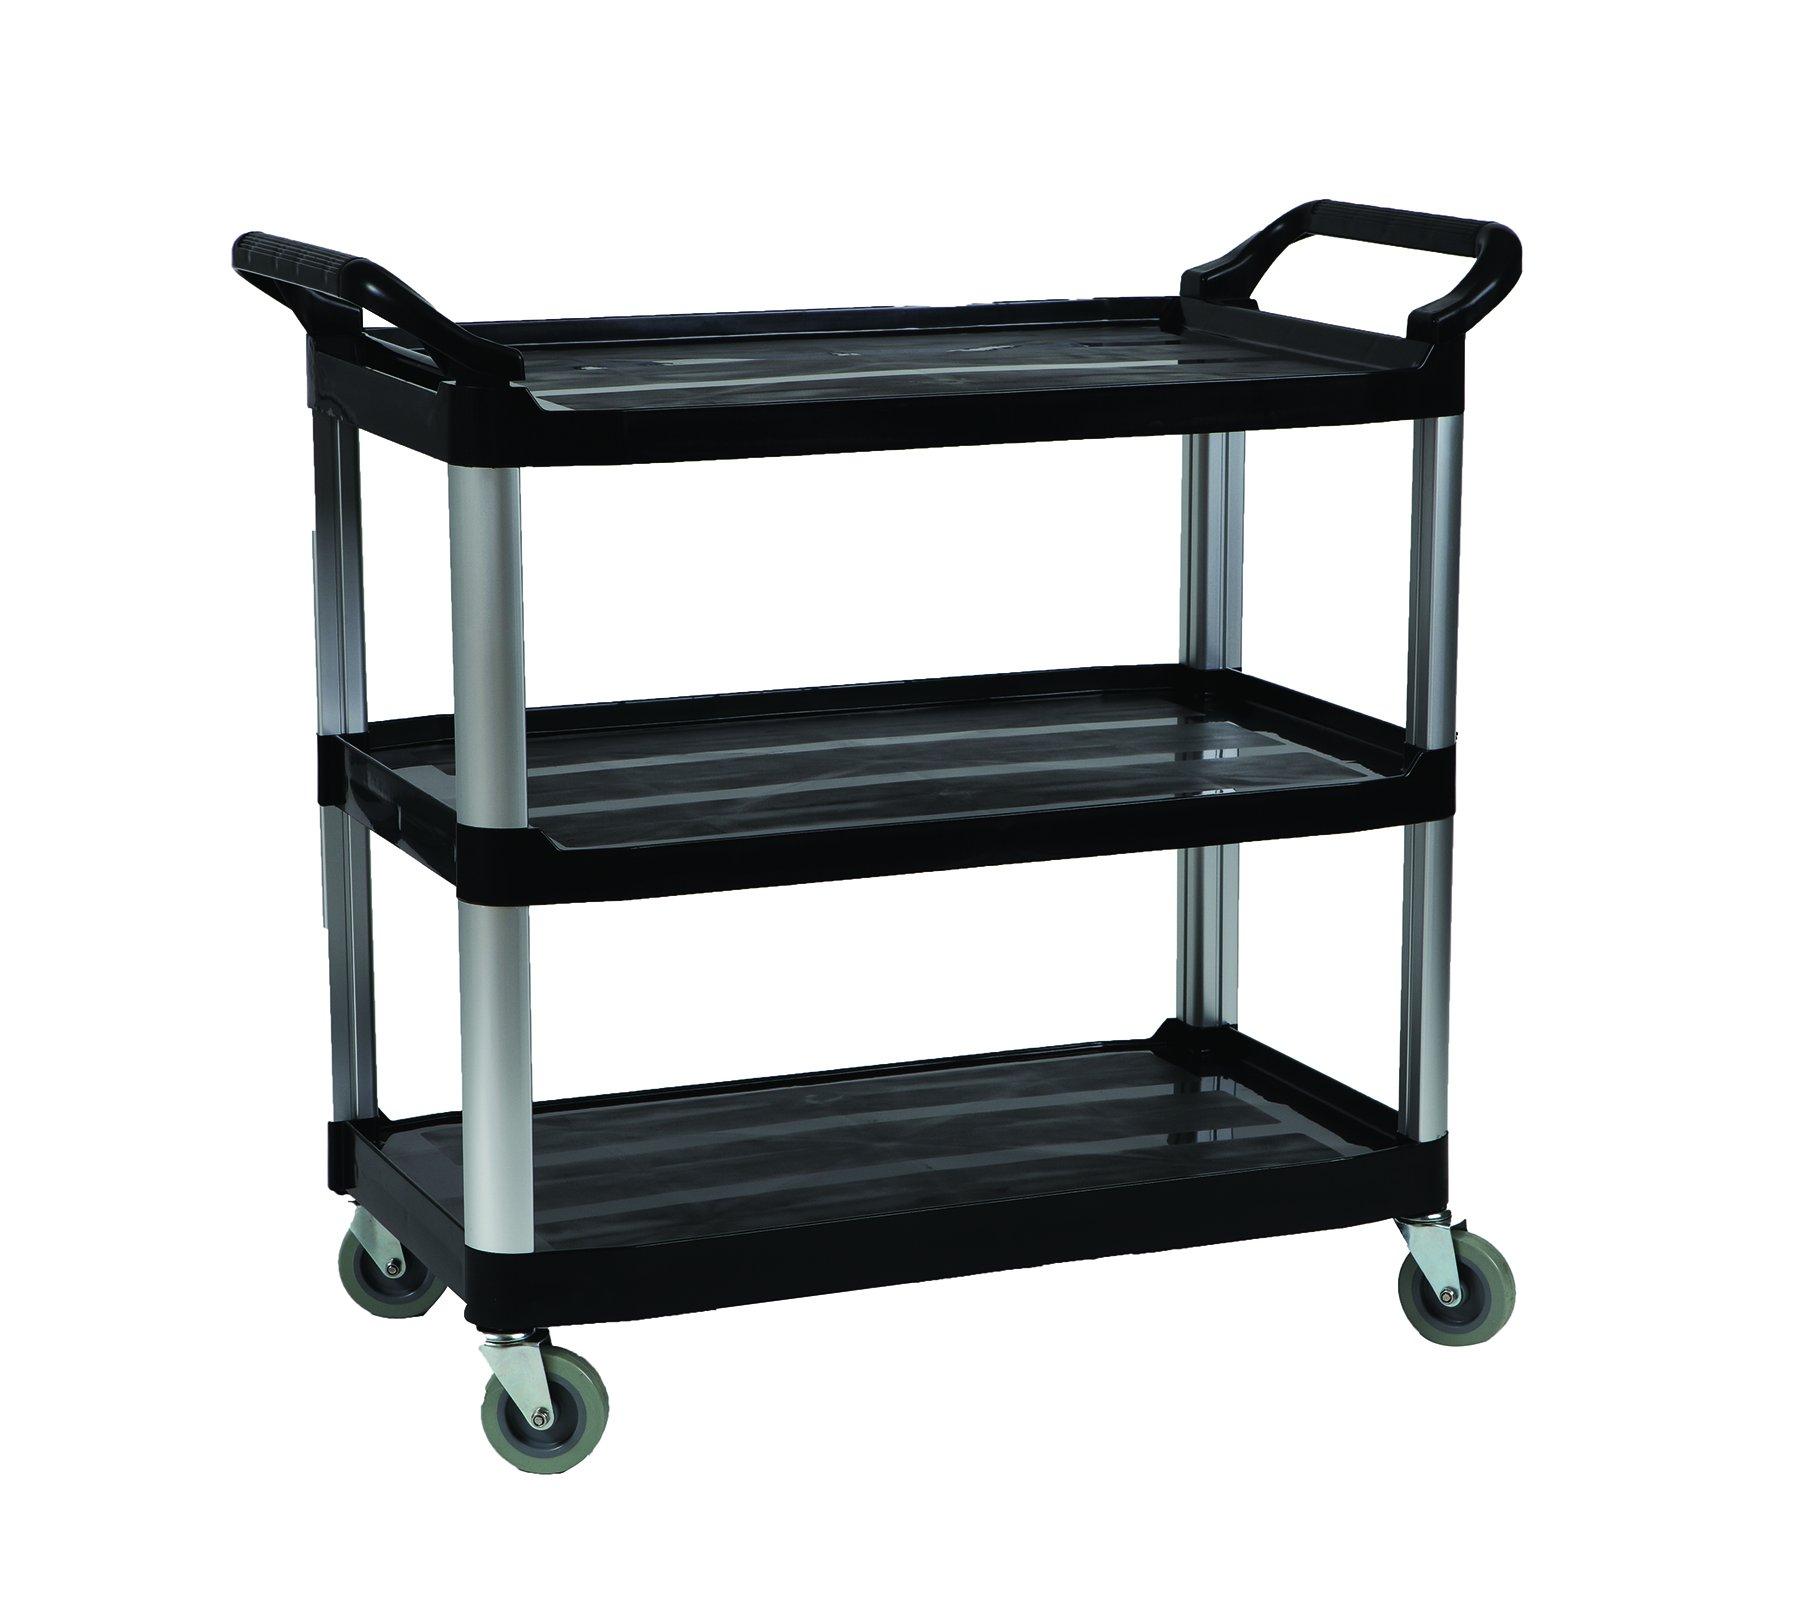 O'Cedar Commercial 96995 Food Service Cart, 3 Shelves